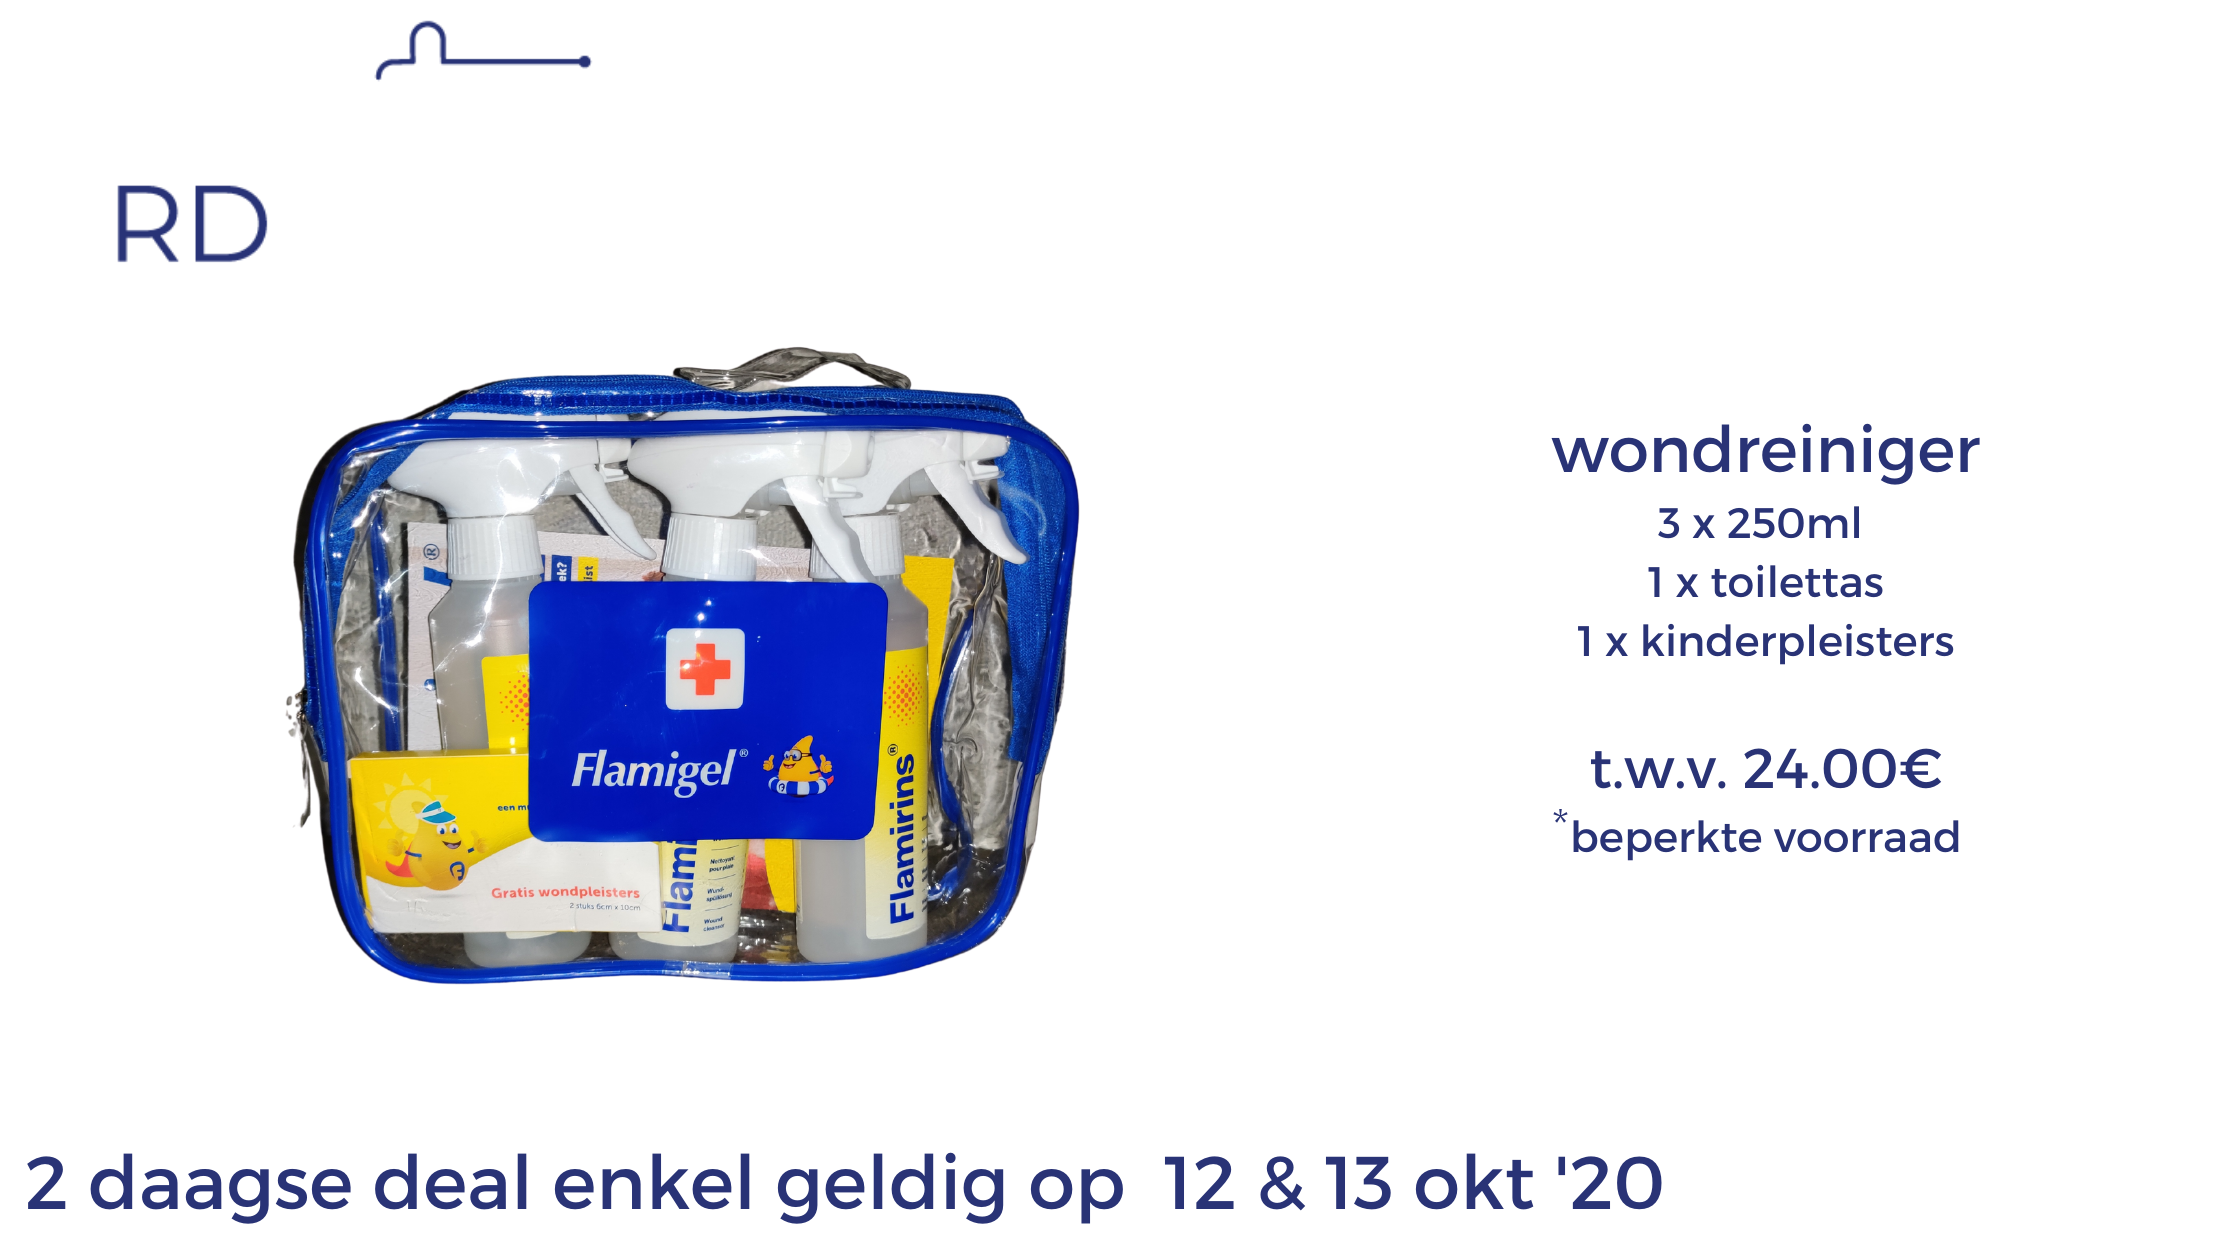 Flamirins